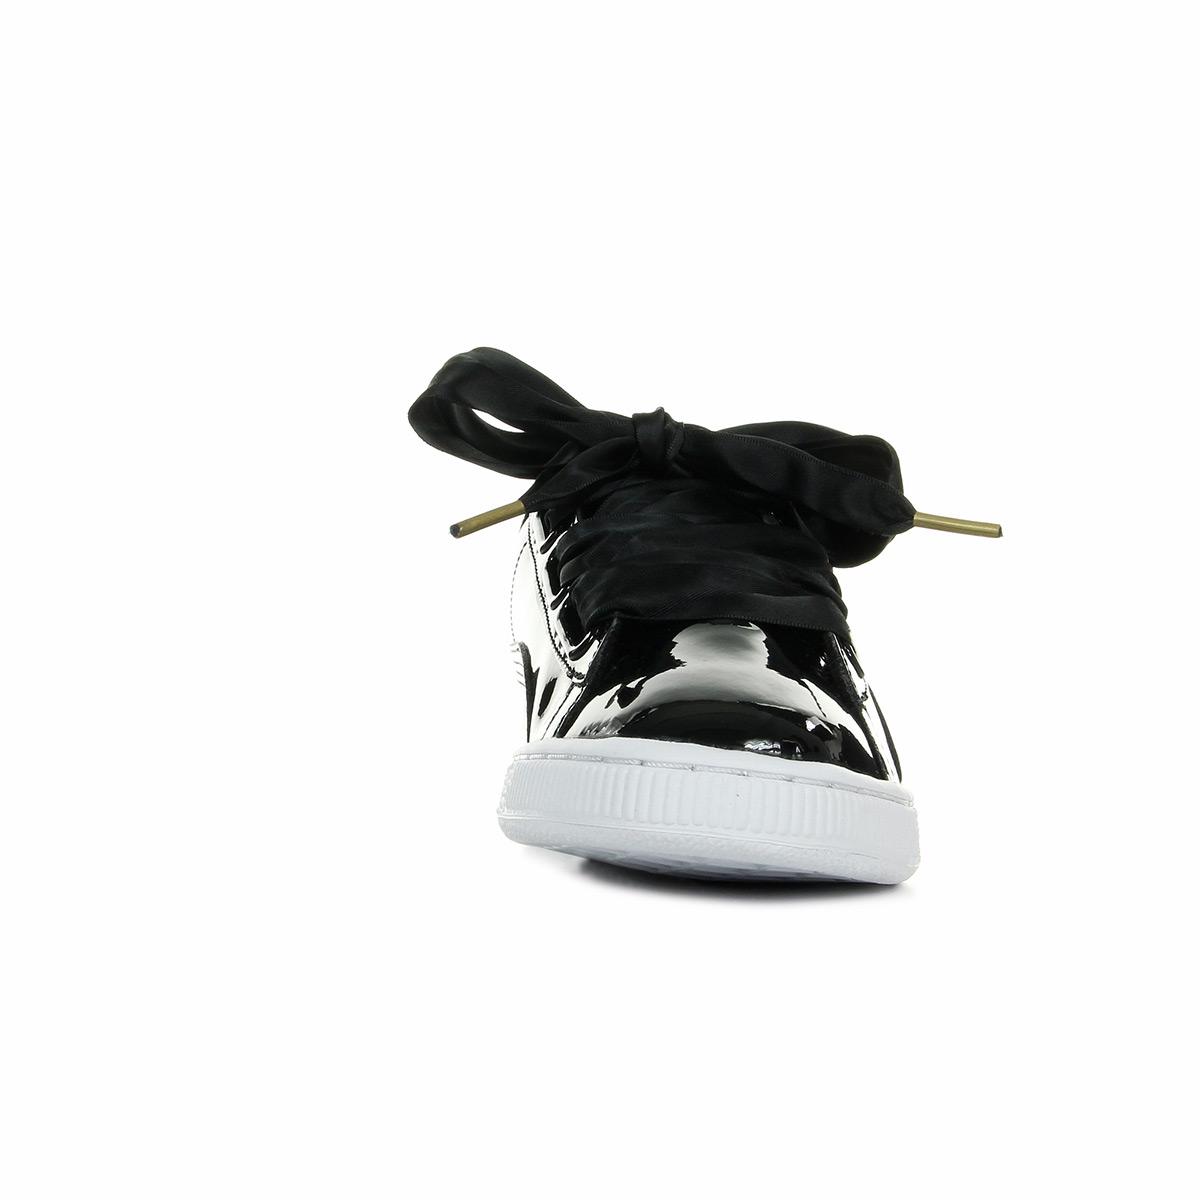 schuhe puma damen basket heart patent wns schwarz ebay. Black Bedroom Furniture Sets. Home Design Ideas